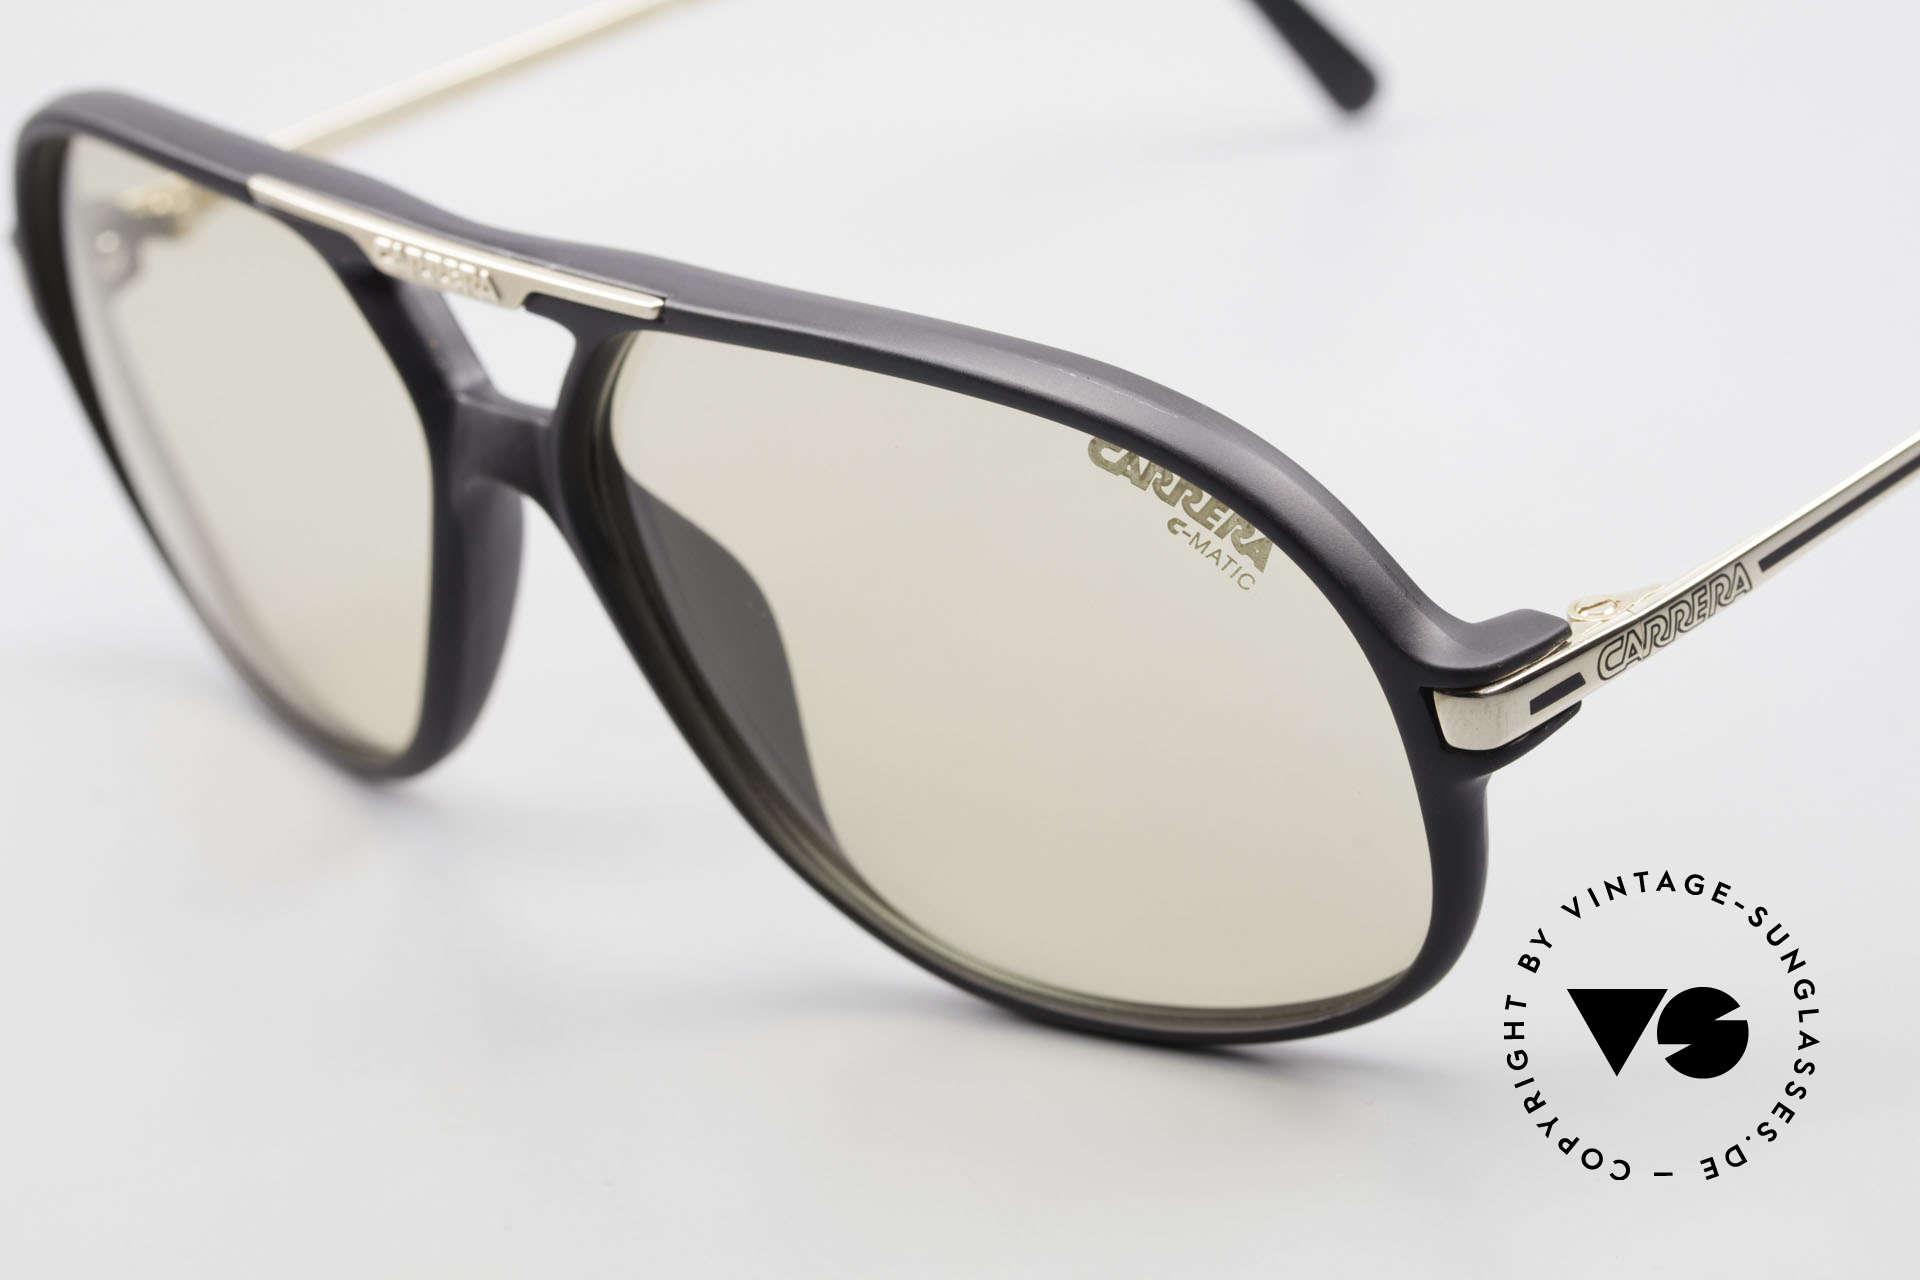 Carrera 5411 C-Matic With Extra Polarized Lenses, 1x extra gray POLARIZED lenses (100% UV protect.), Made for Men